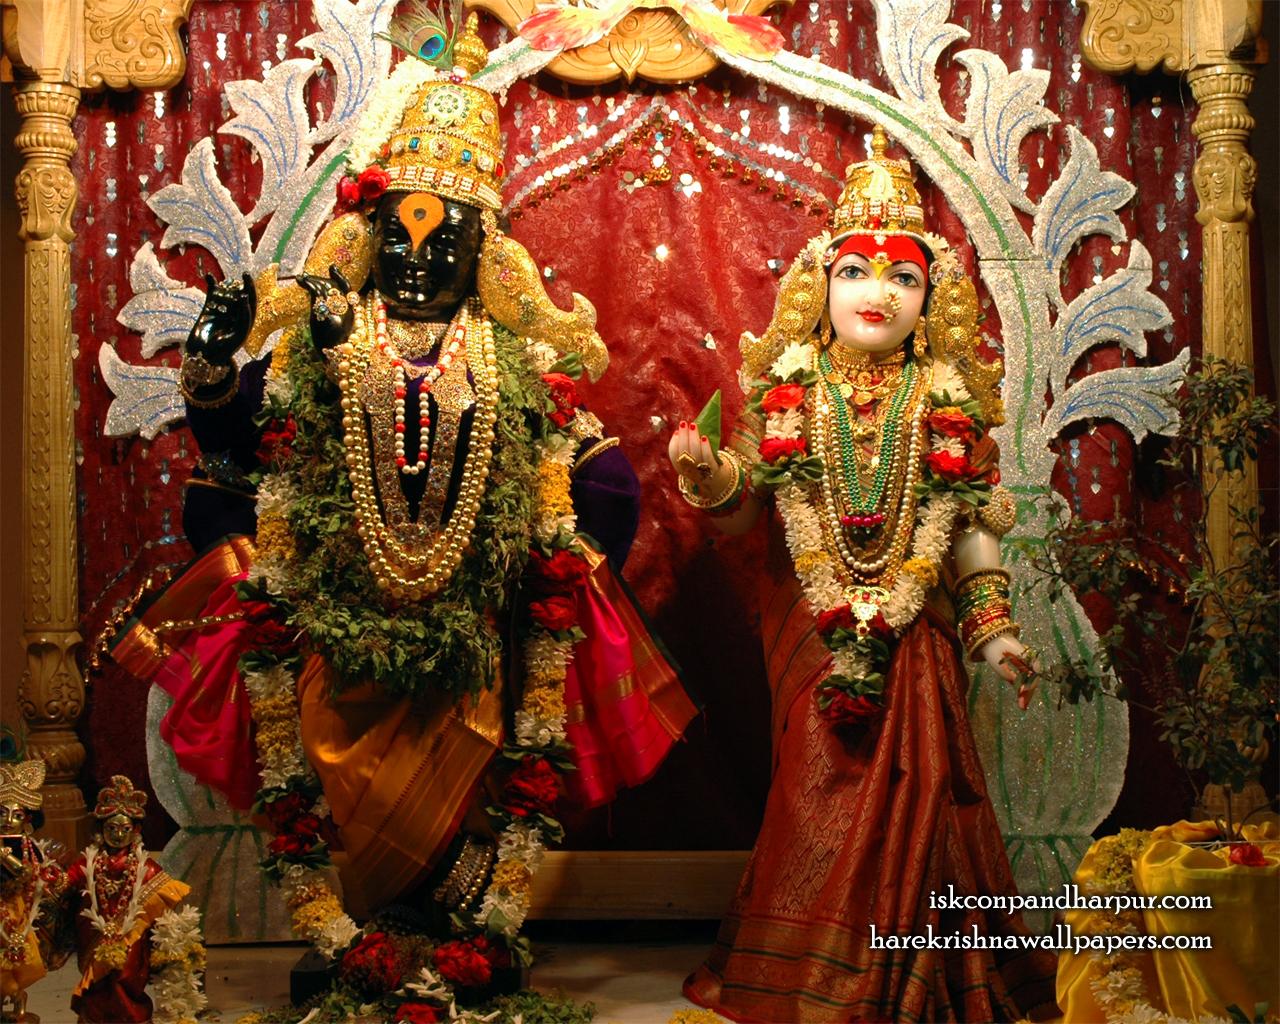 Sri Sri Radha Pandharinath Wallpaper (002) Size 1280x1024 Download